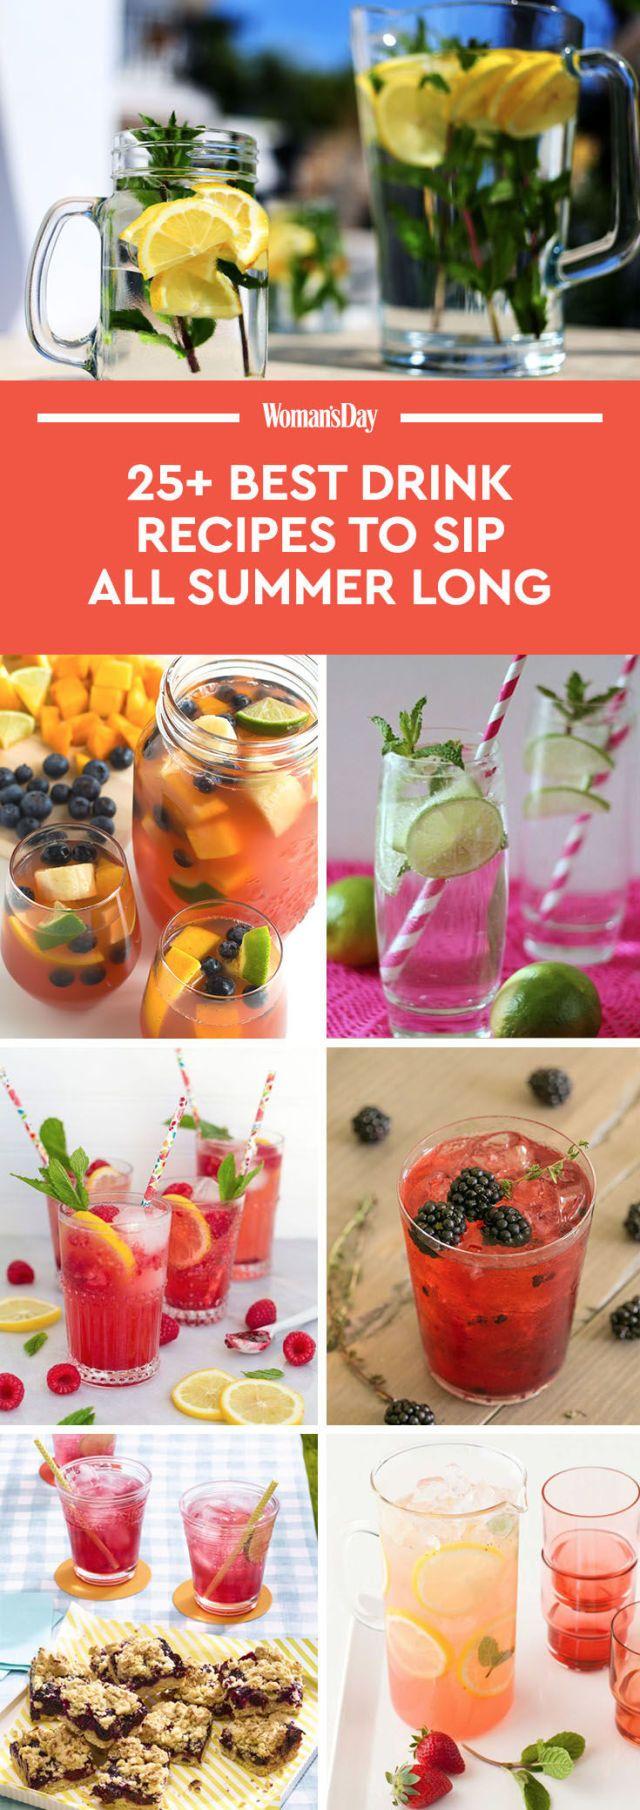 33 Best Summer Drink Recipes